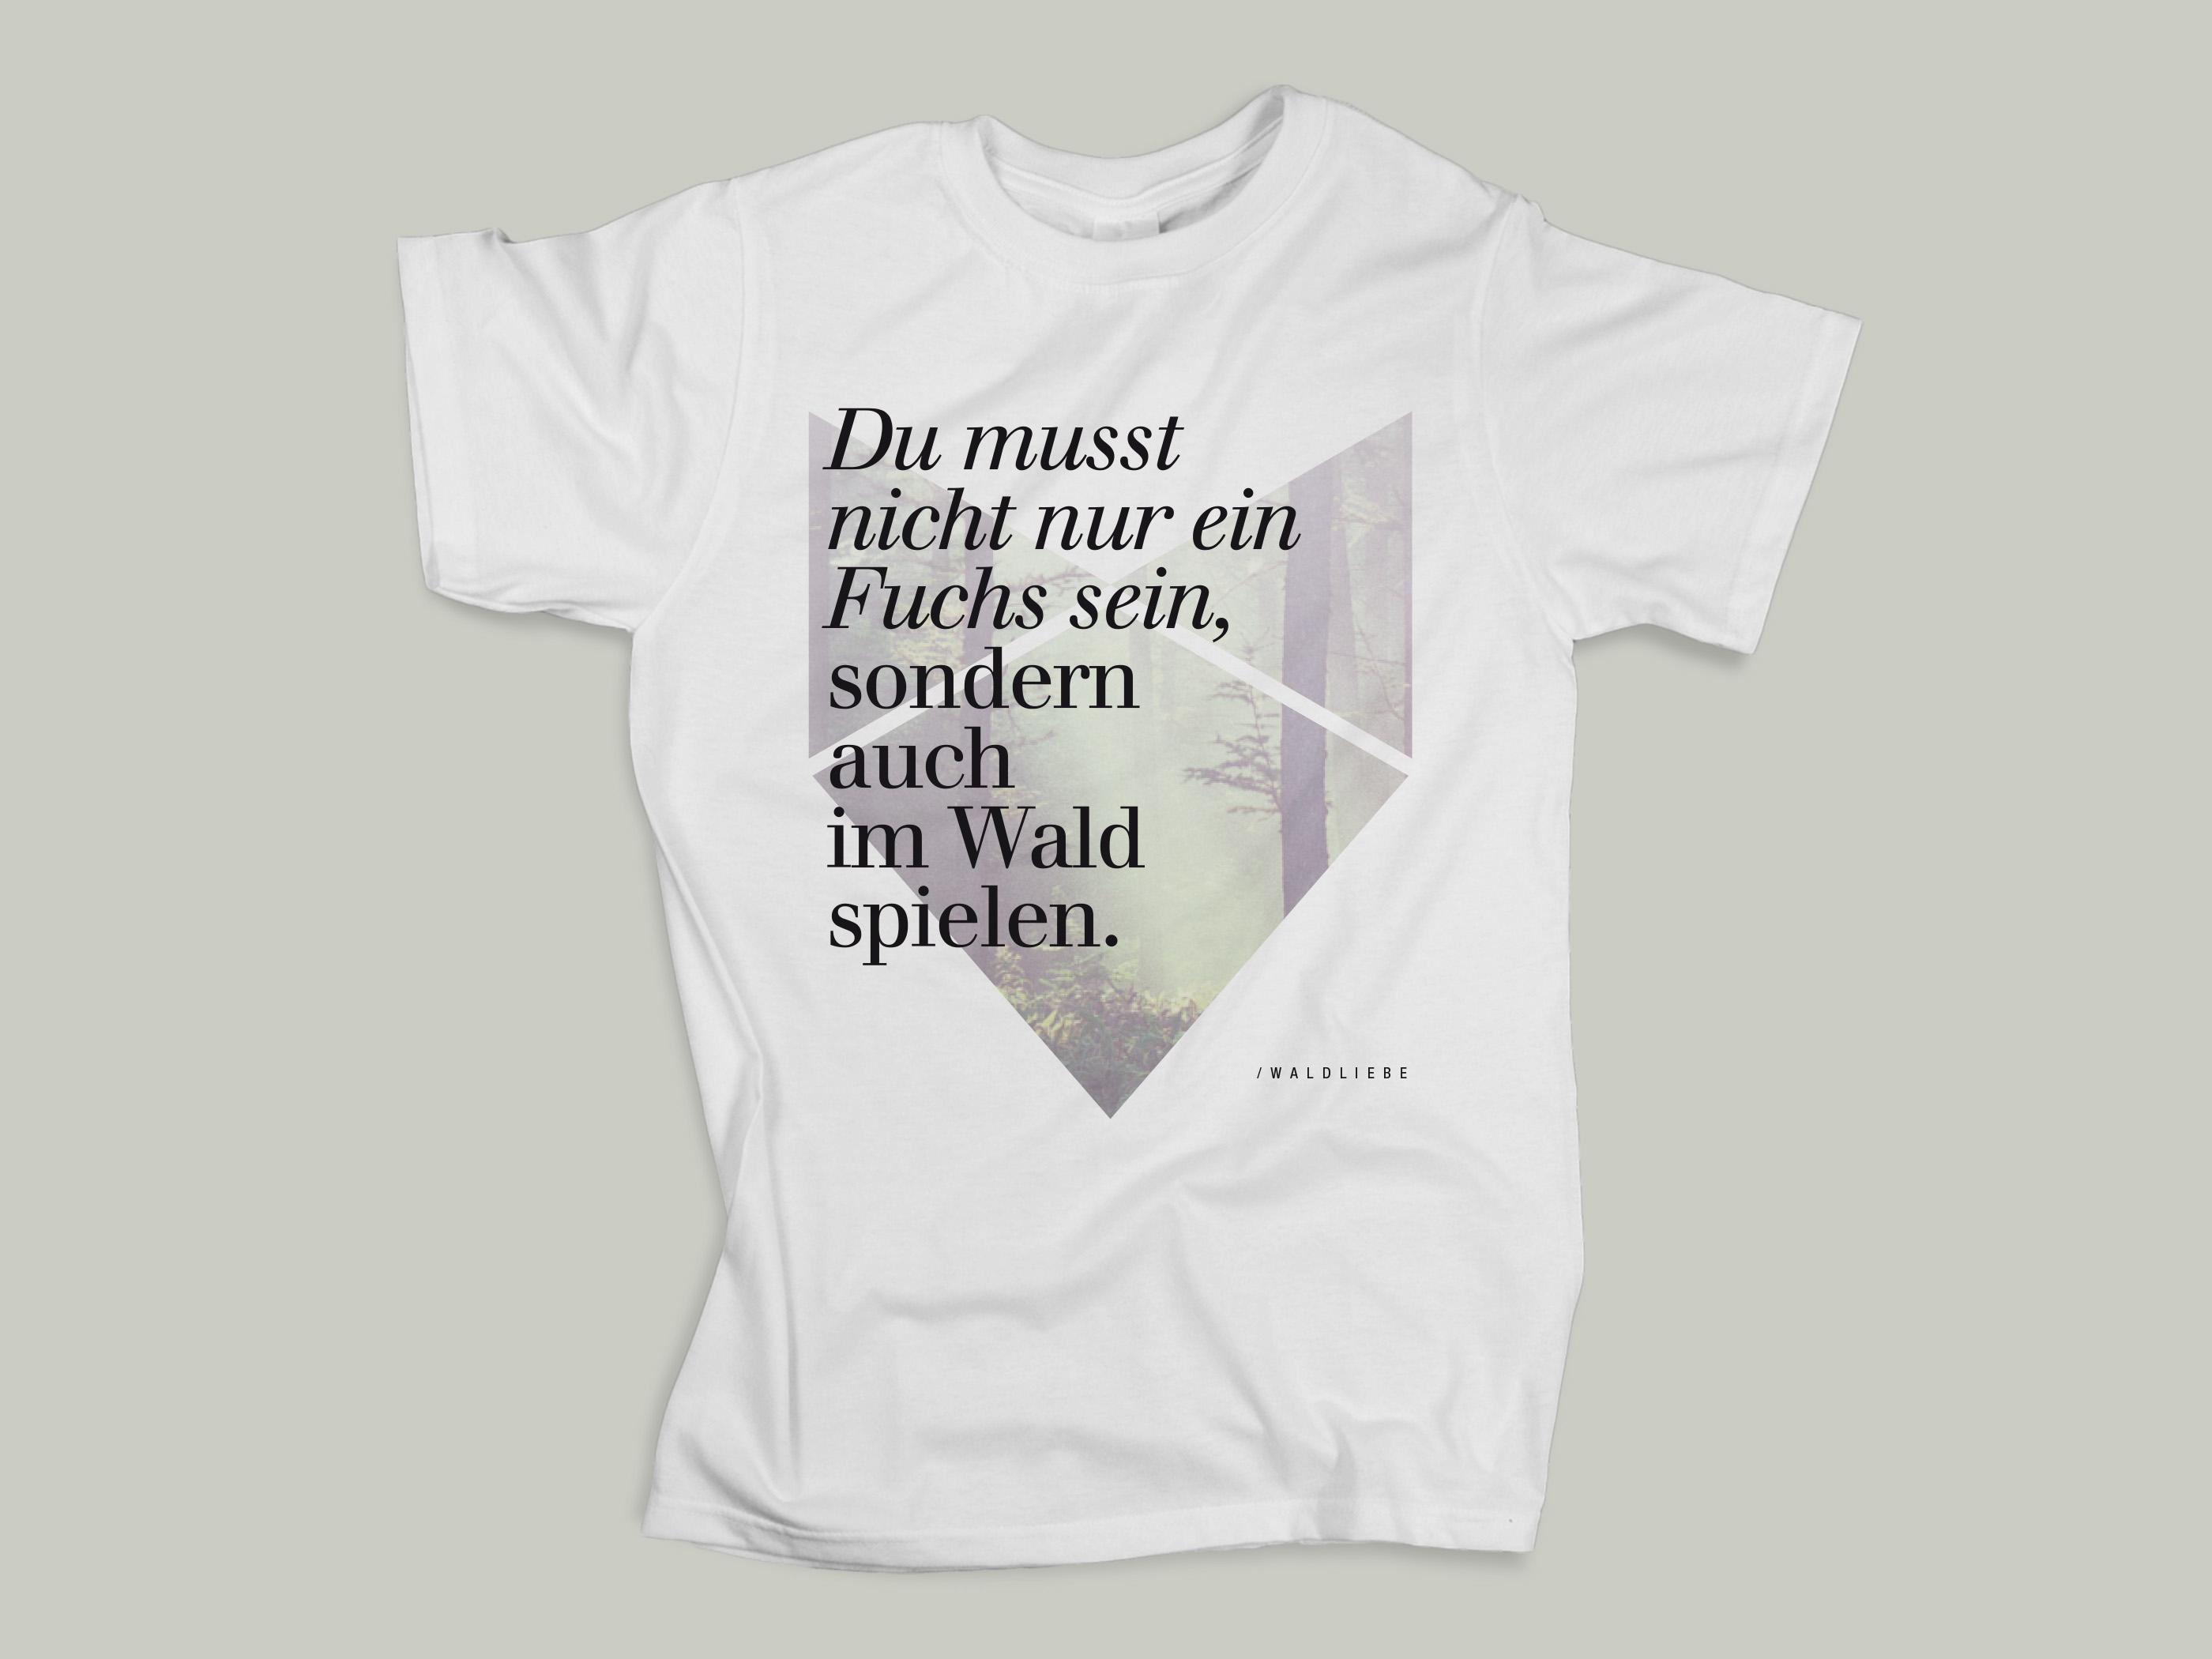 Dirk Siedhoff / Shirt